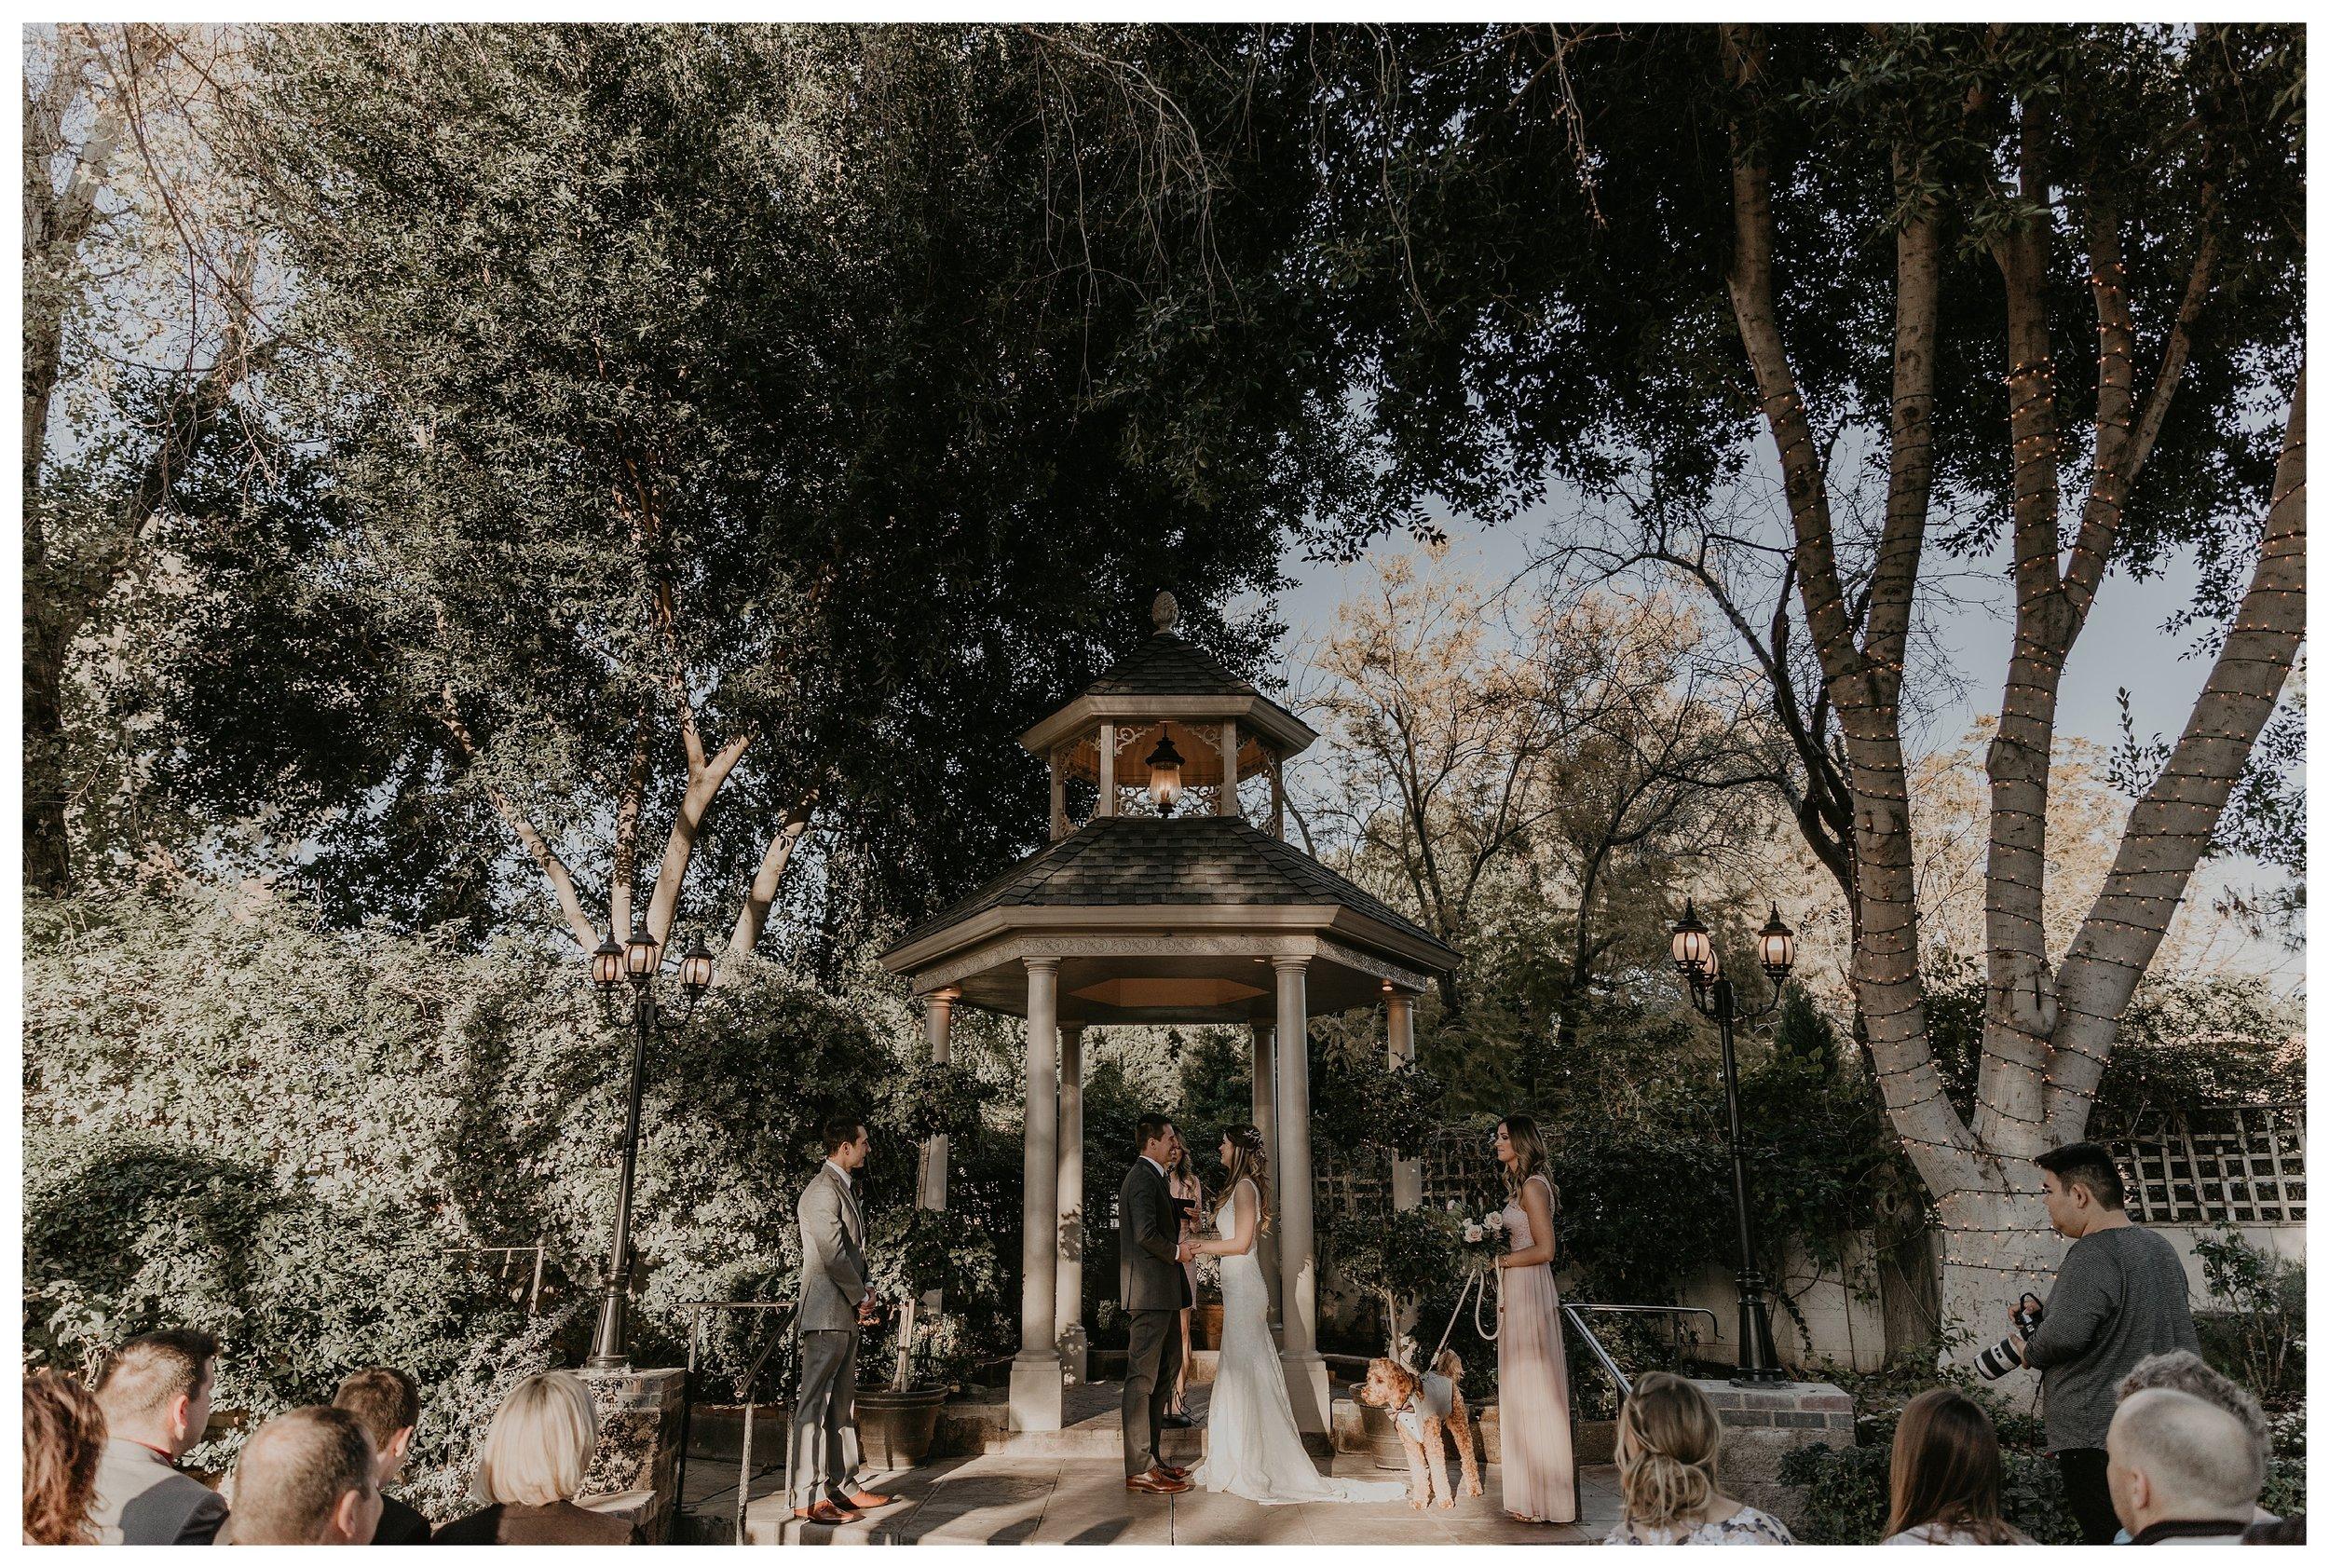 The Wright House Wedding Ceremony site